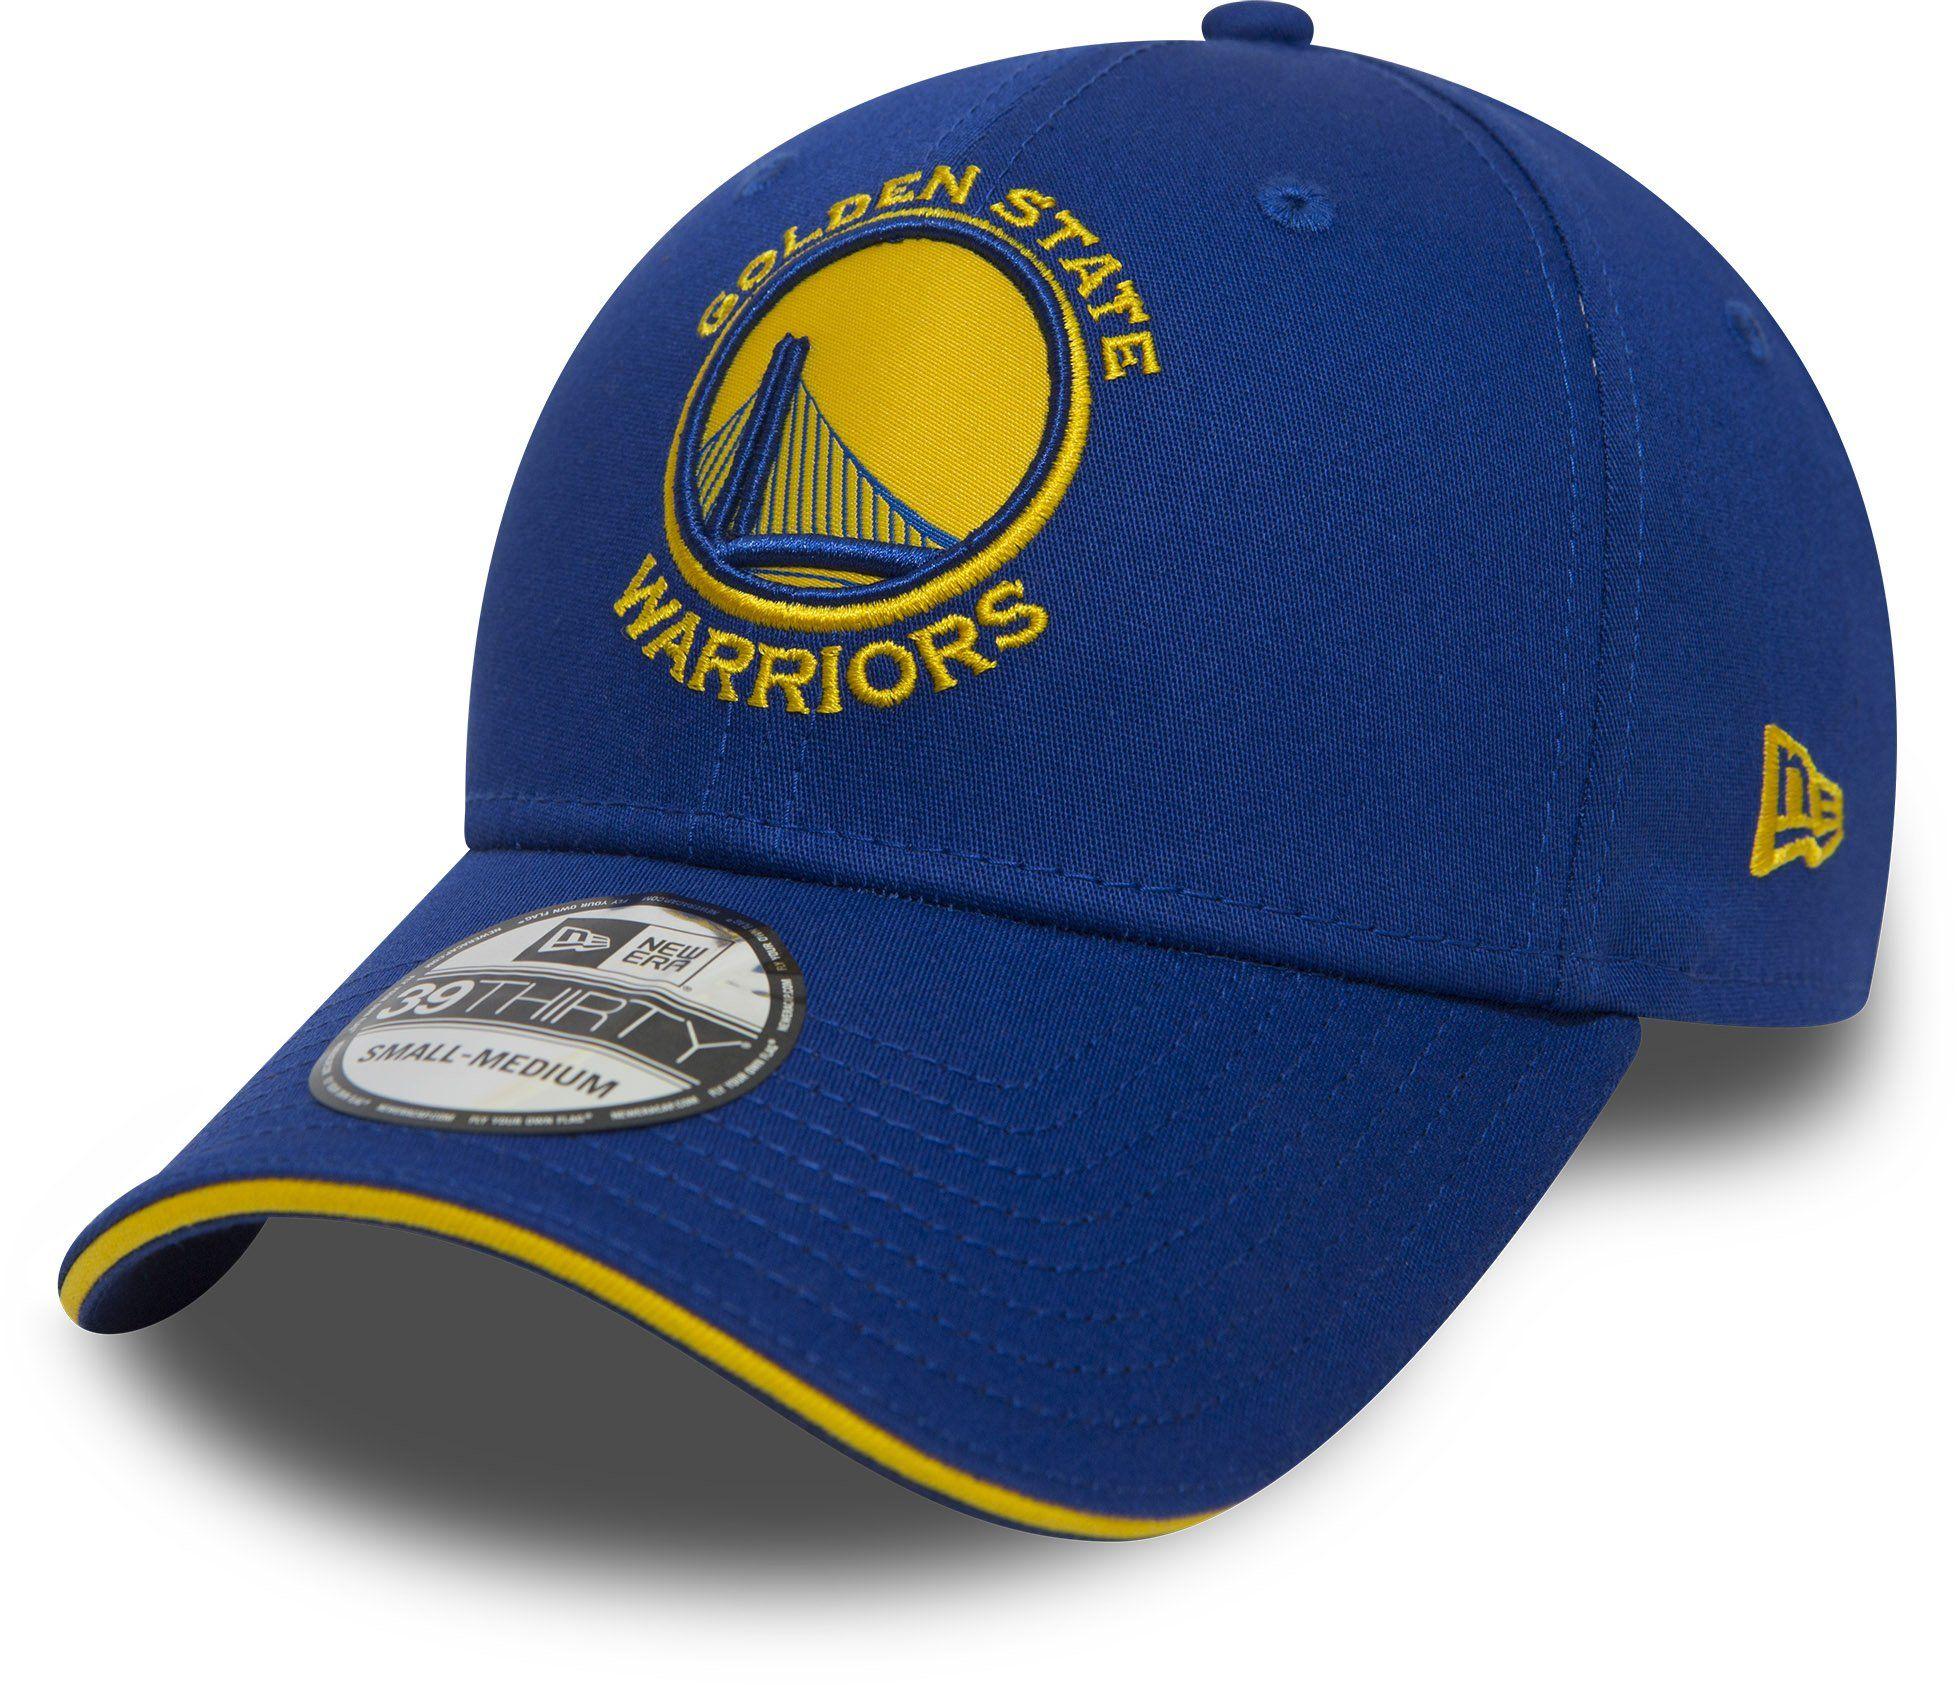 874fe8ac1b2ca5 Golden State Warriors New Era 3930 NBA Team Stretch Fit Cap – lovemycap